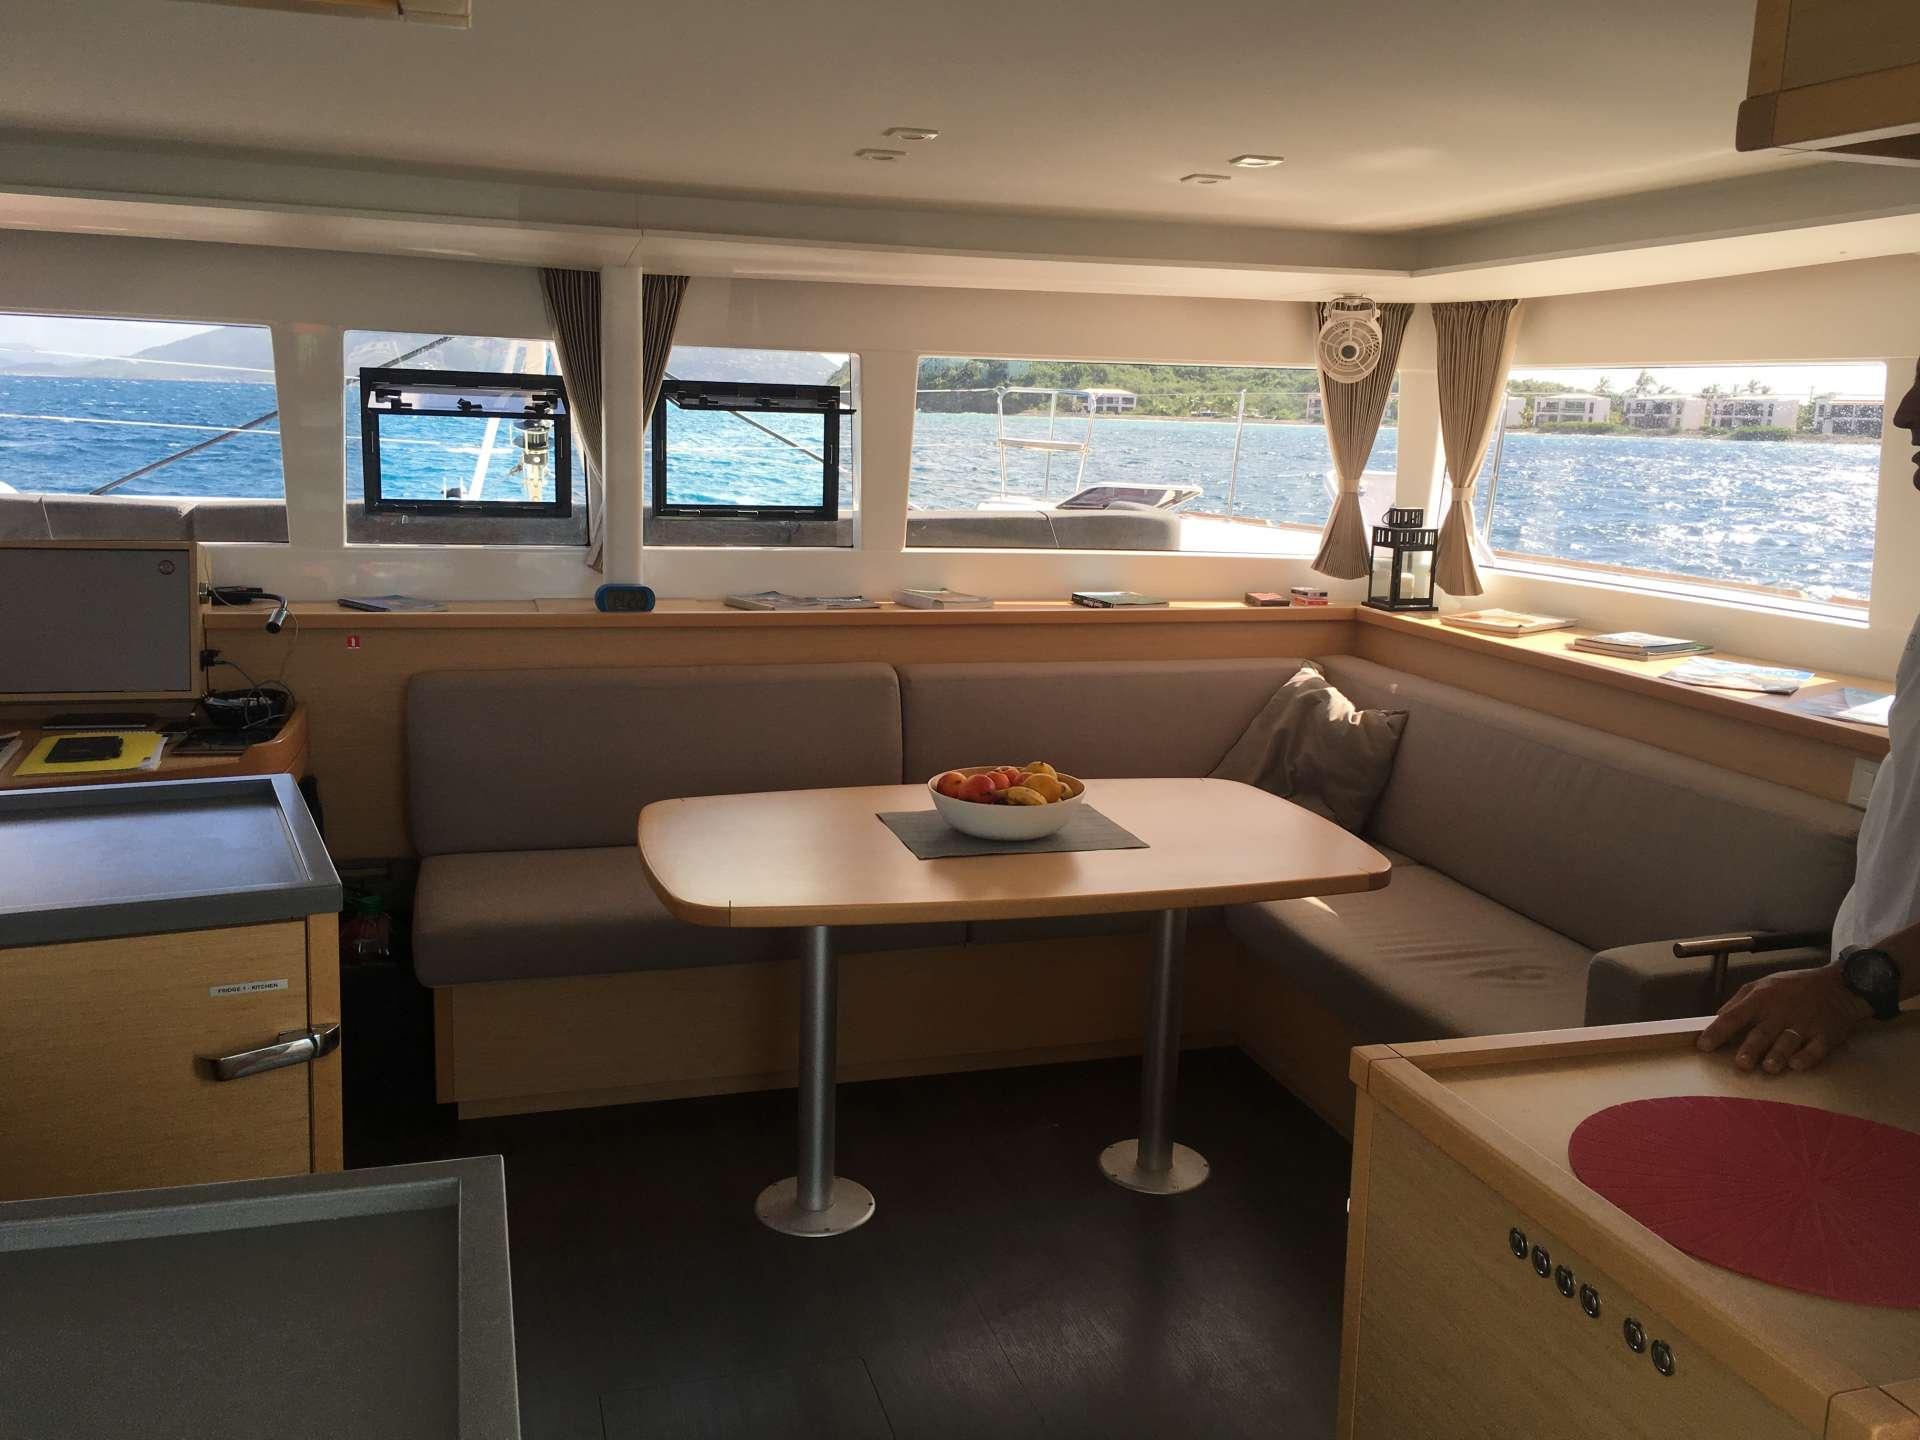 LUFINHA yacht image # 1